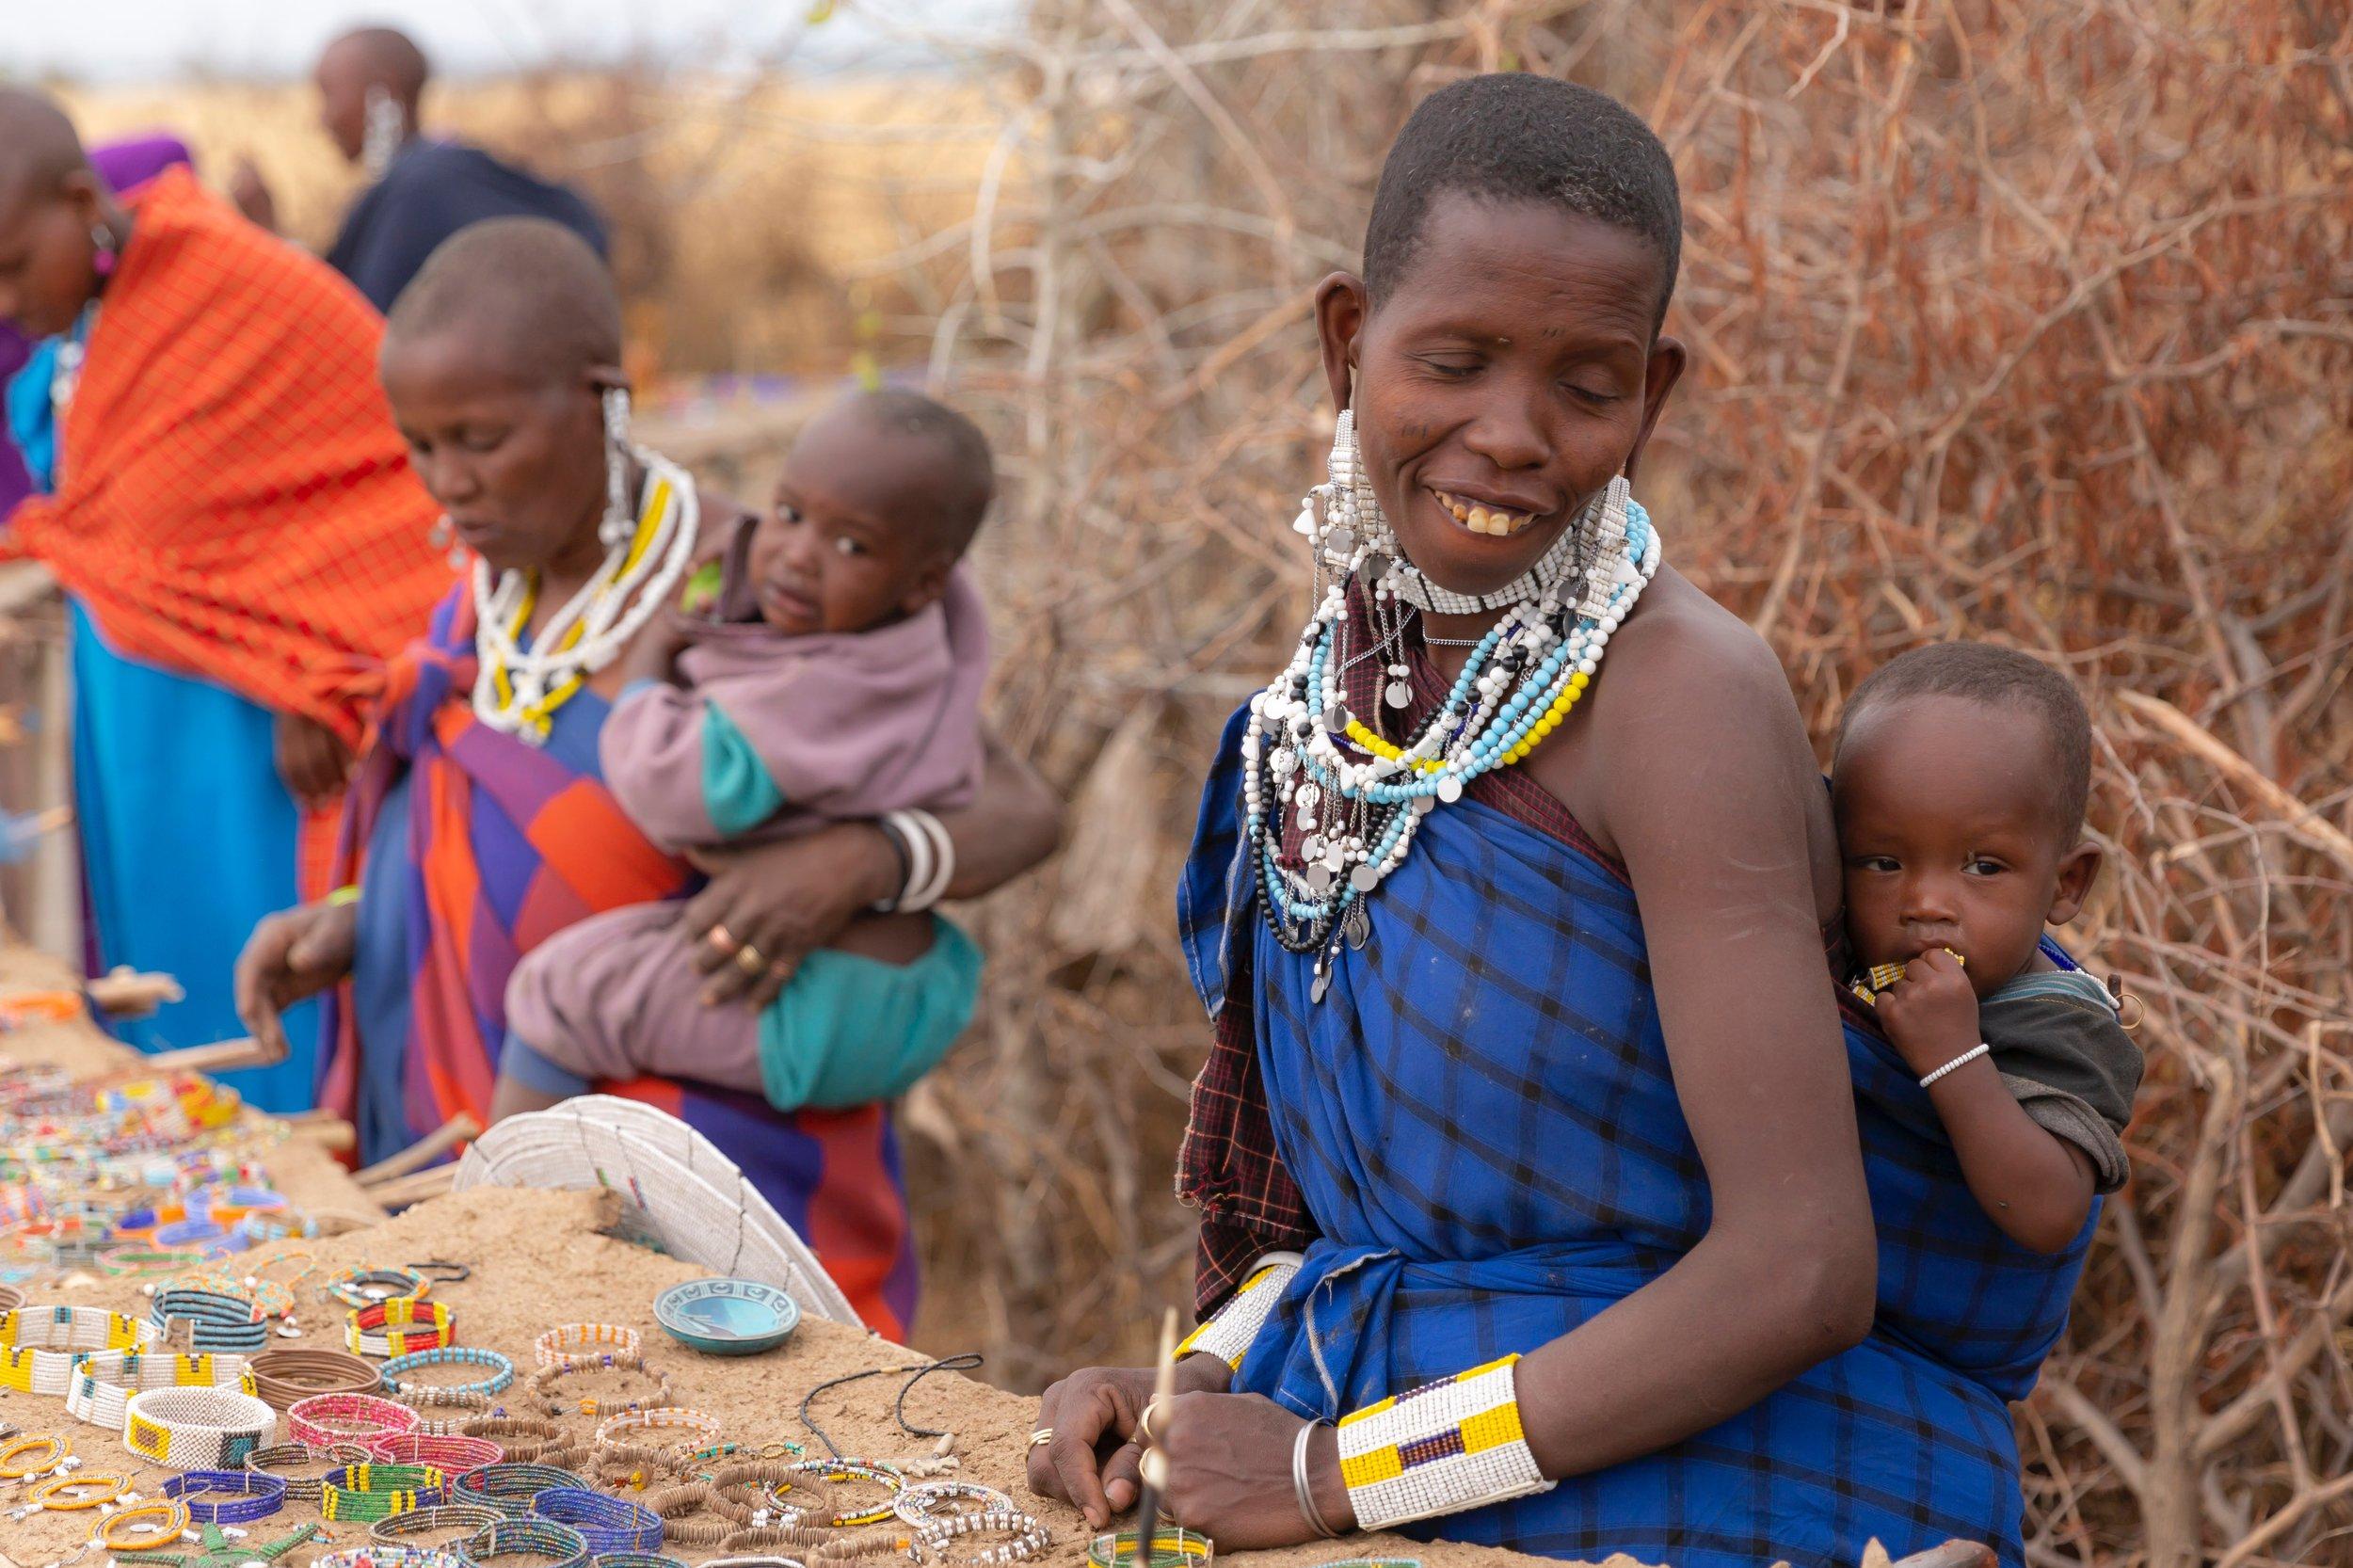 Jambo! - We're headed back to Kenya!